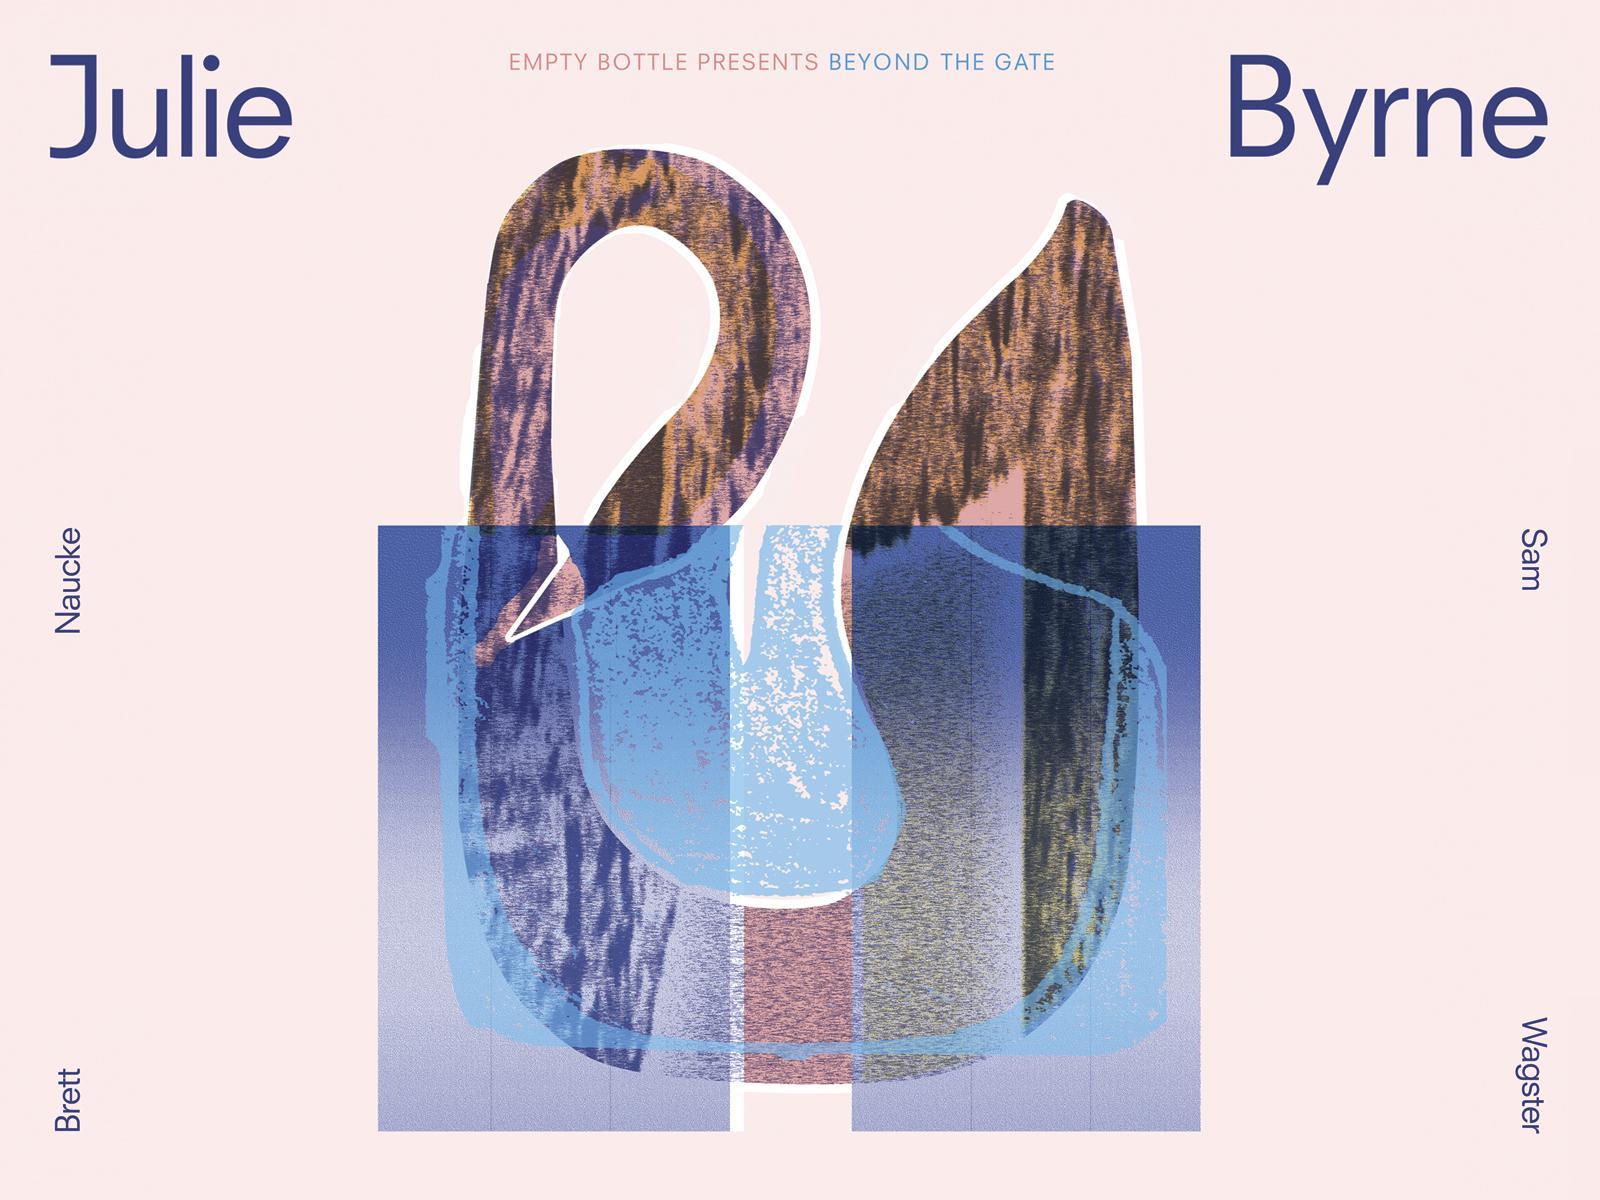 Beyond The Gate featuring Julie Byrne / Brett Naucke / Sam Wagster